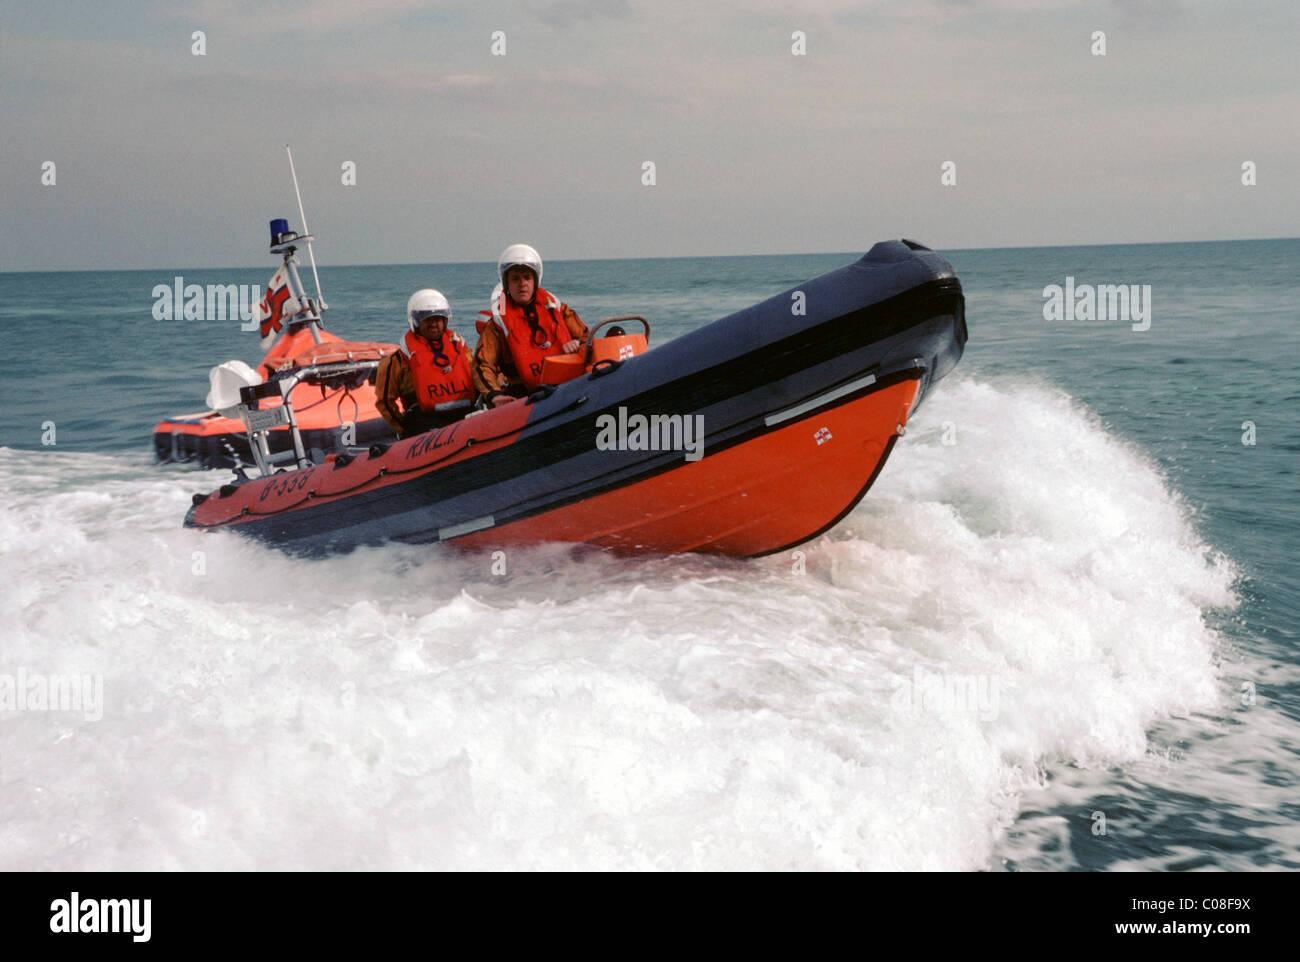 RNLI lifeboat - Stock Image